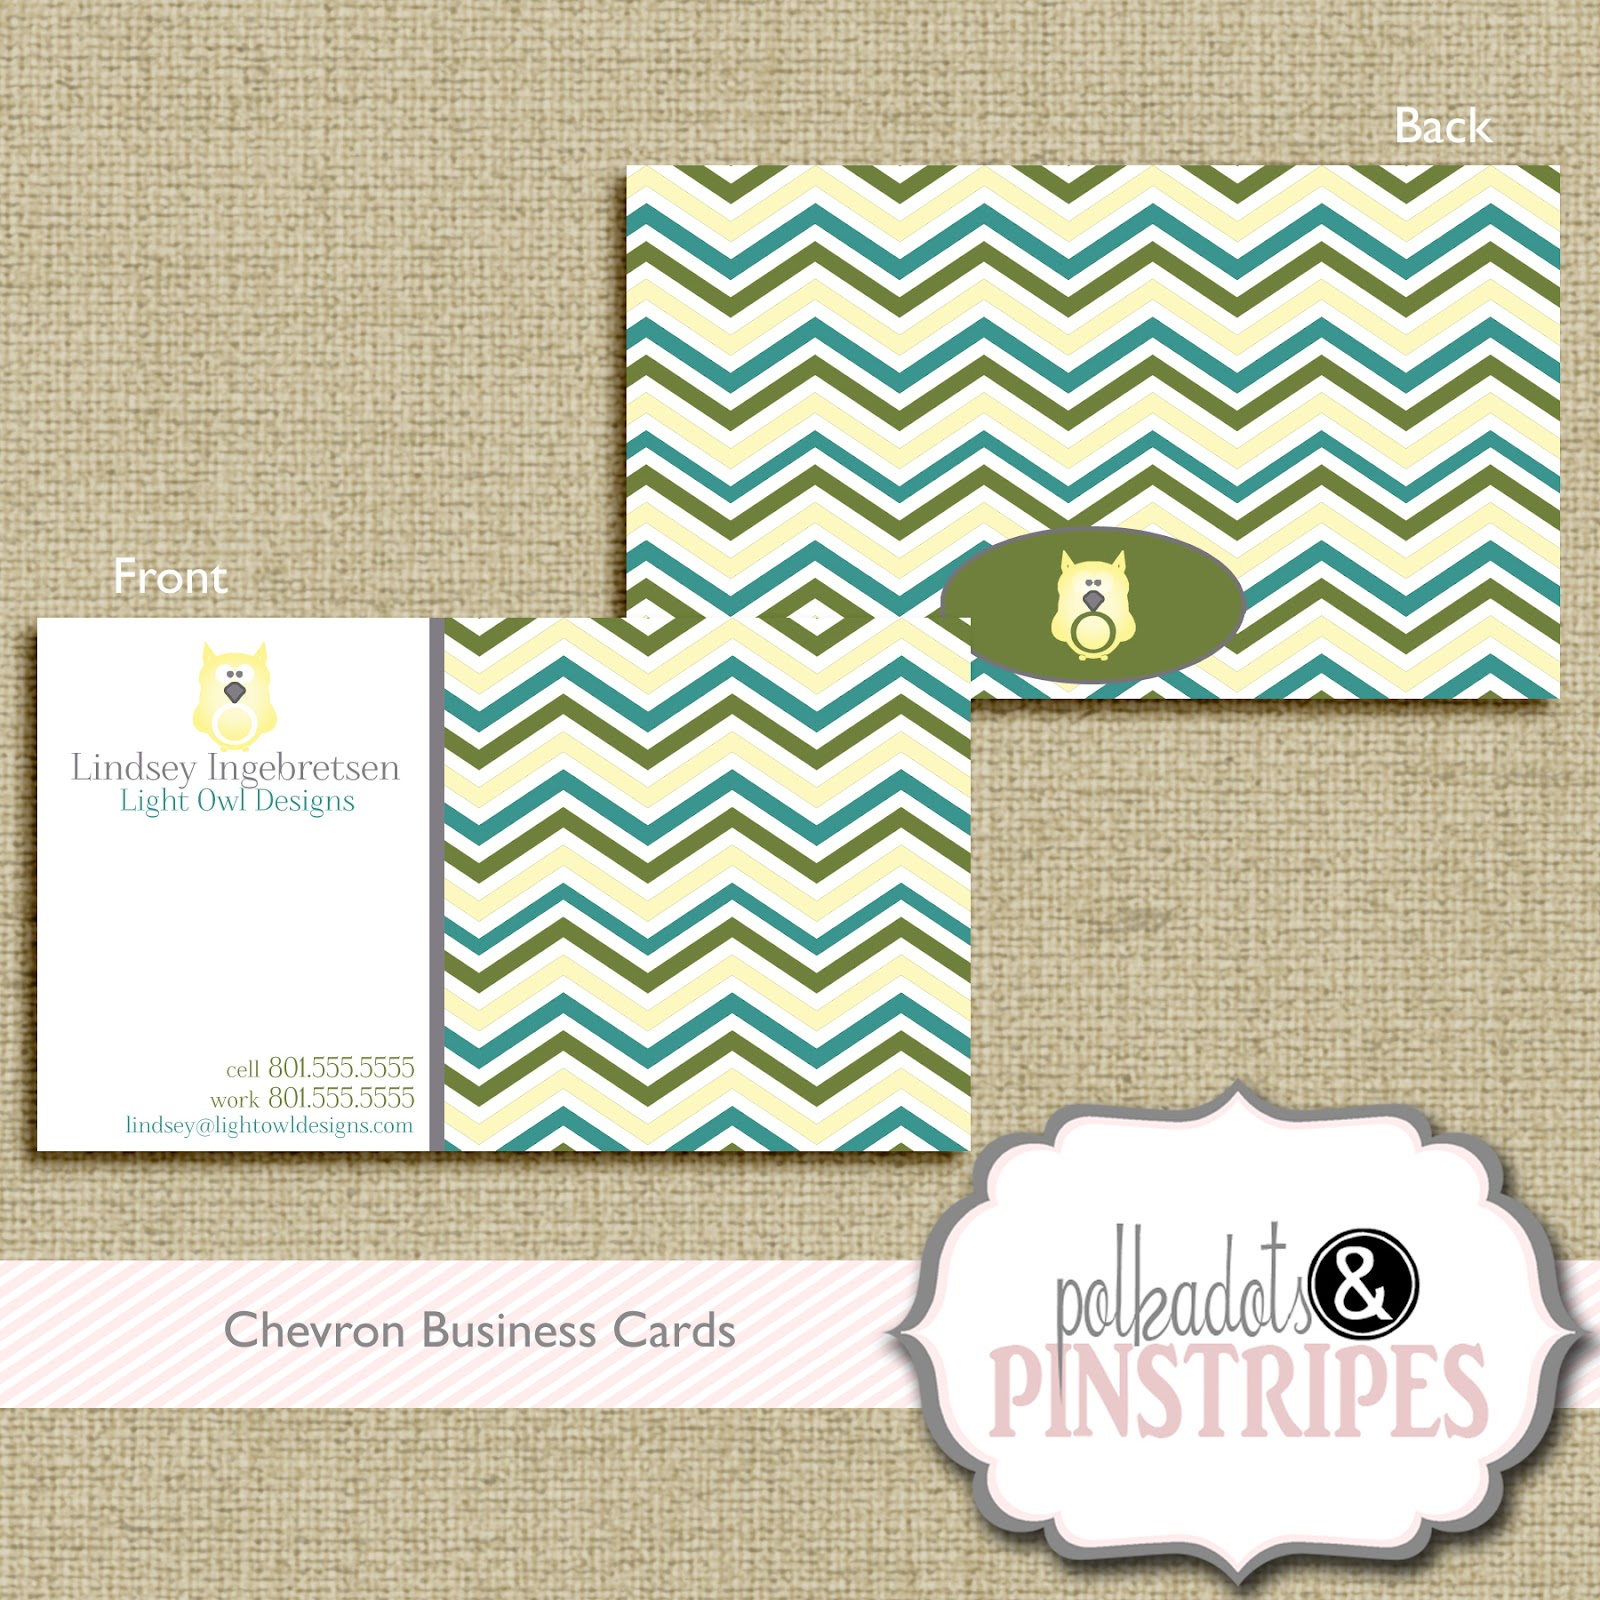 Polka dots n pinstripes business cards chevron business card 1000 colourmoves